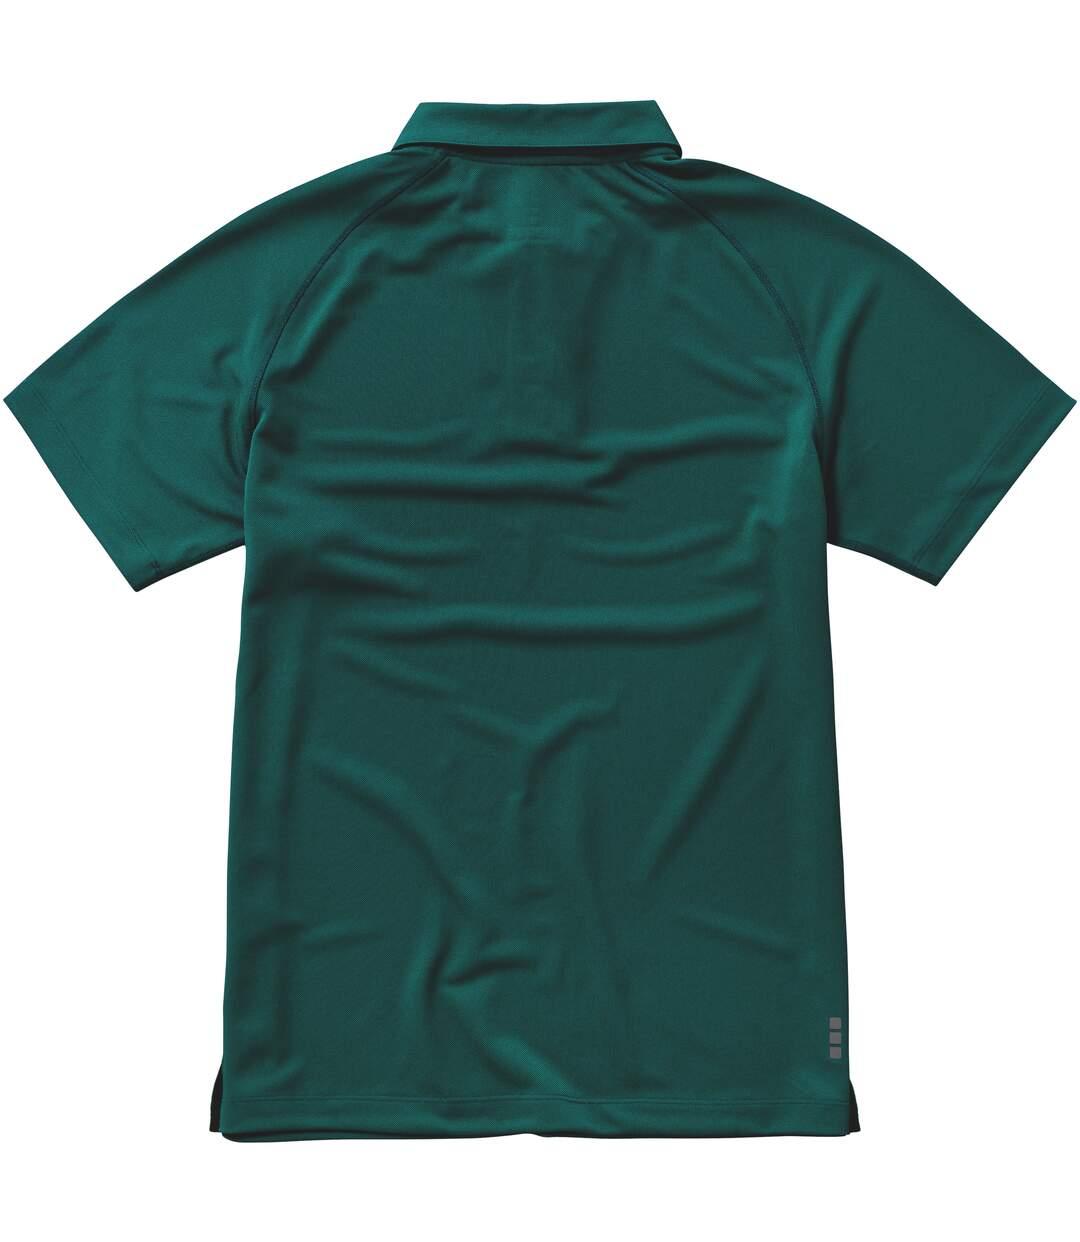 Elevate Mens Ottawa Short Sleeve Polo (Forest Green) - UTPF1890